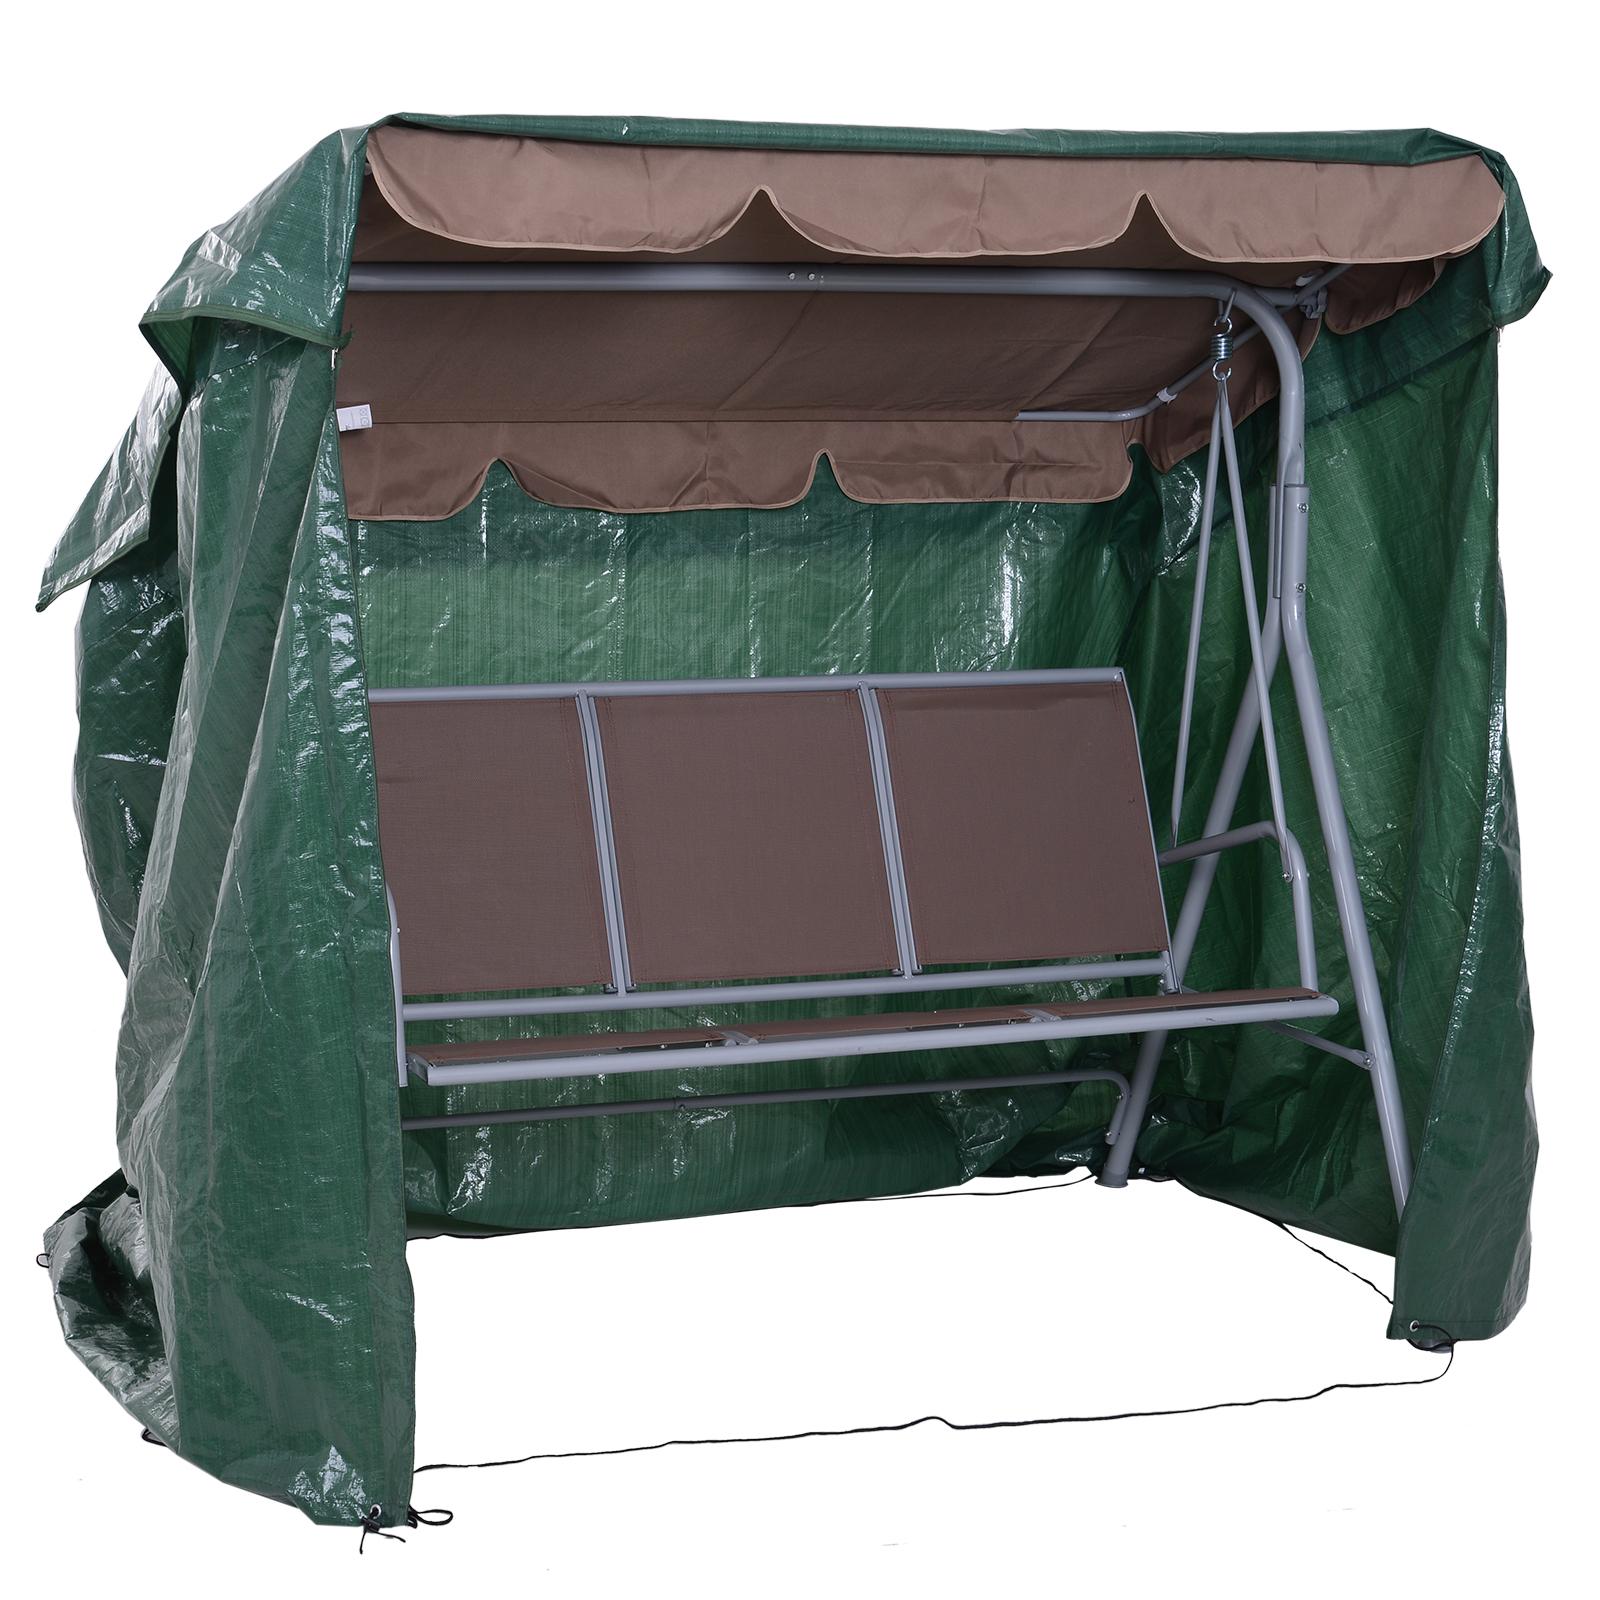 Outsunny Prelata de Acoperit pentru Mobilier de Extern Impermeabil Anti Mucegai cu Fixaj in PE, Verde,215x155x150cm imagine aosom.ro